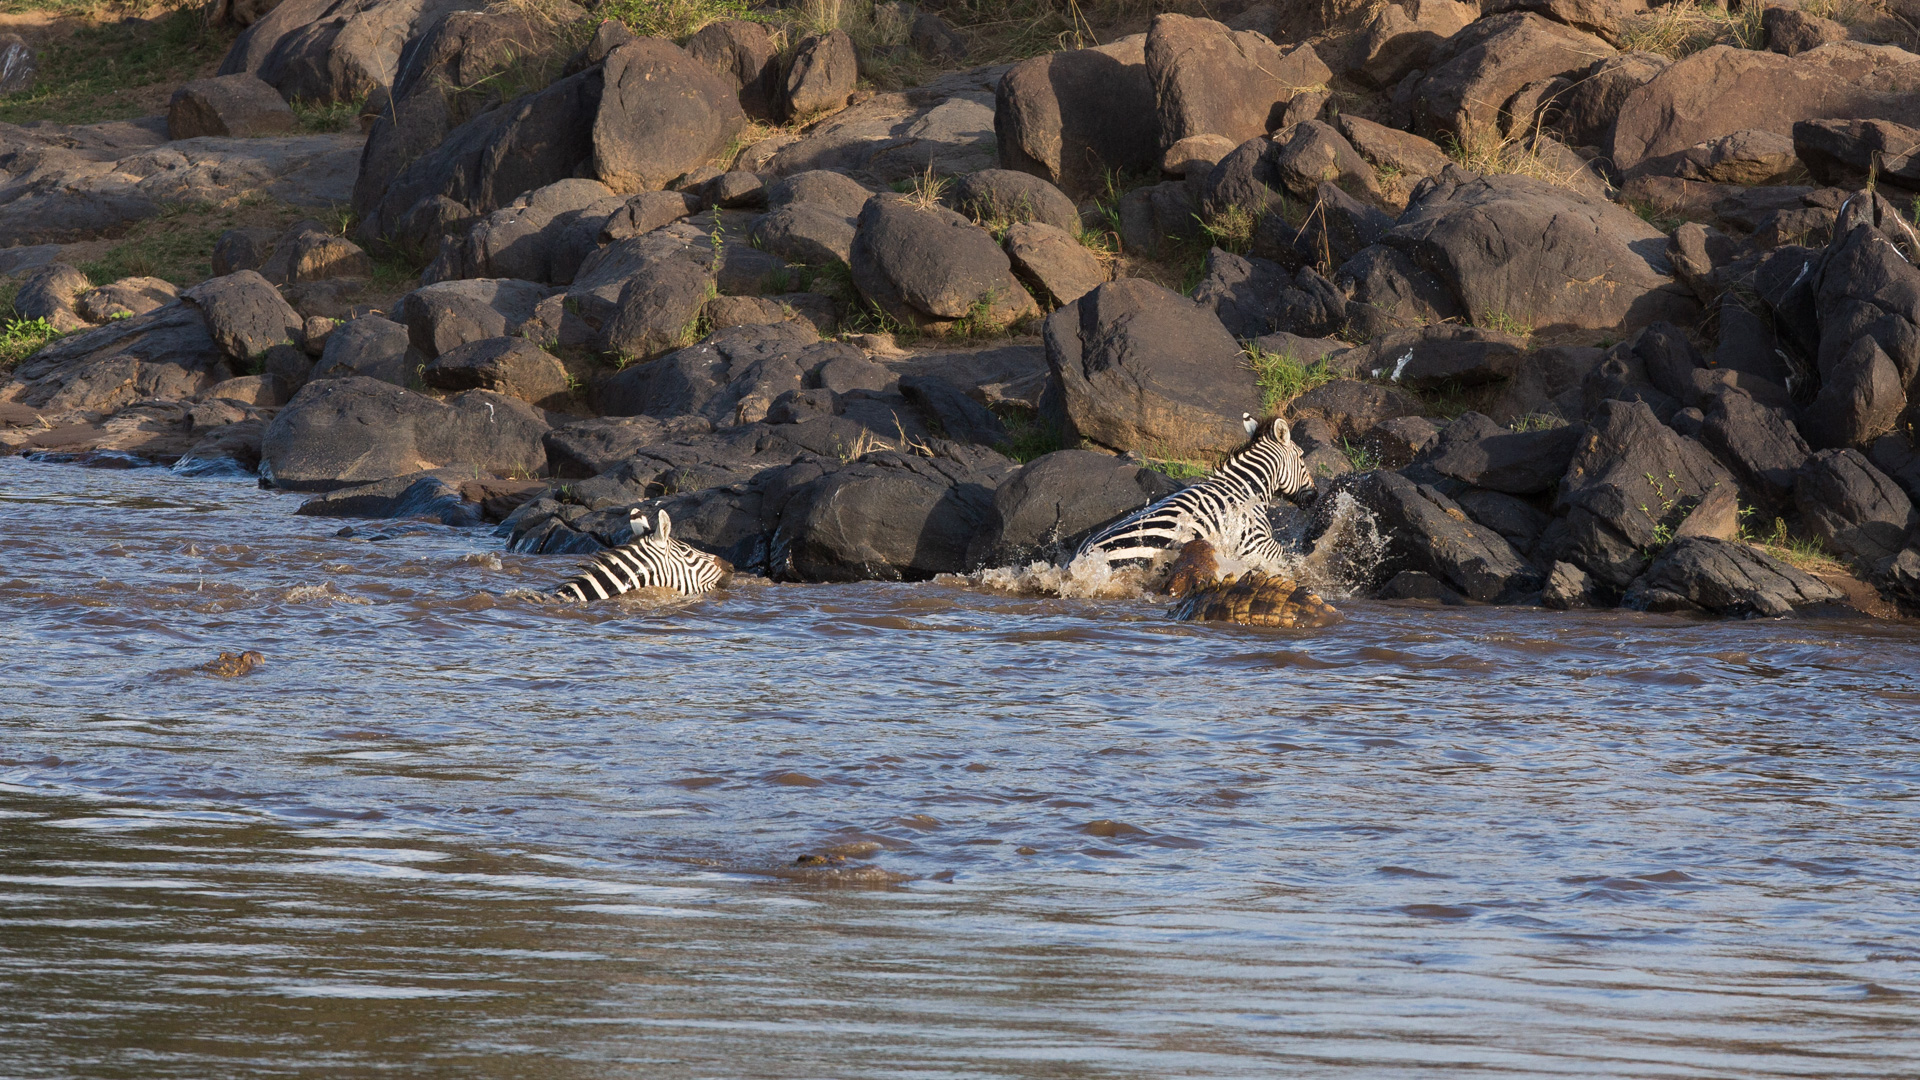 More crocodiles and zebra